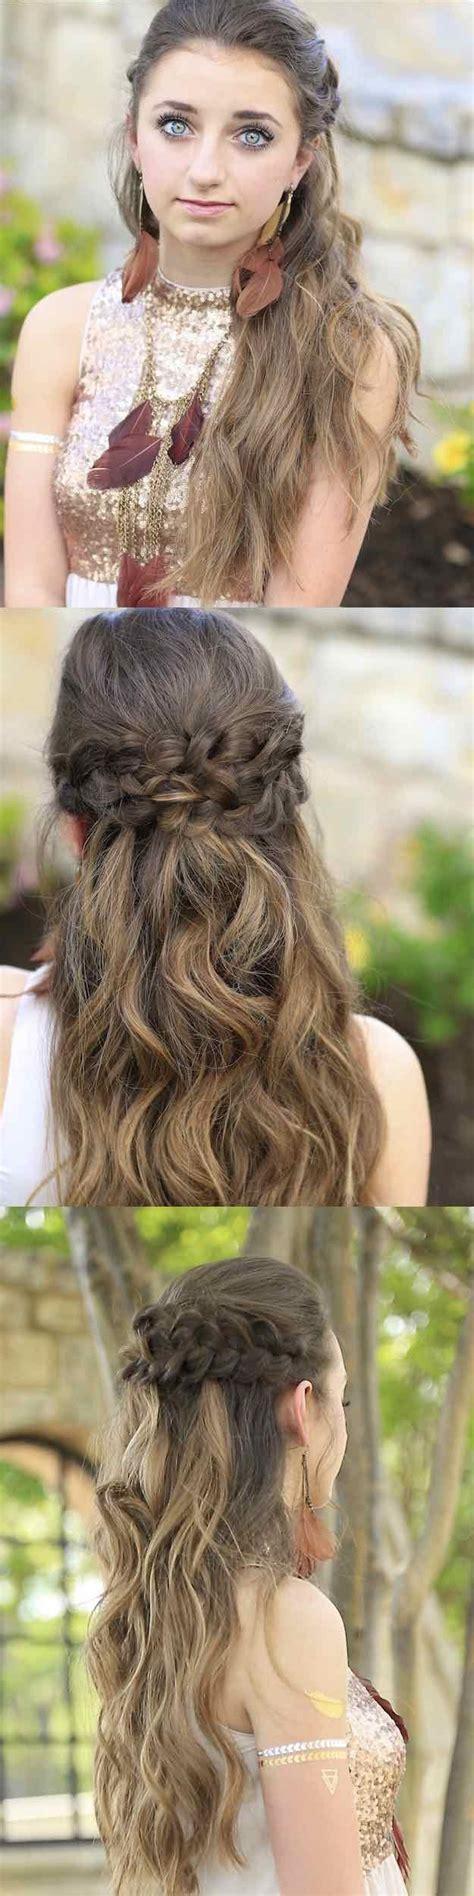 Long Straight Hairstyles Half Up Half Down